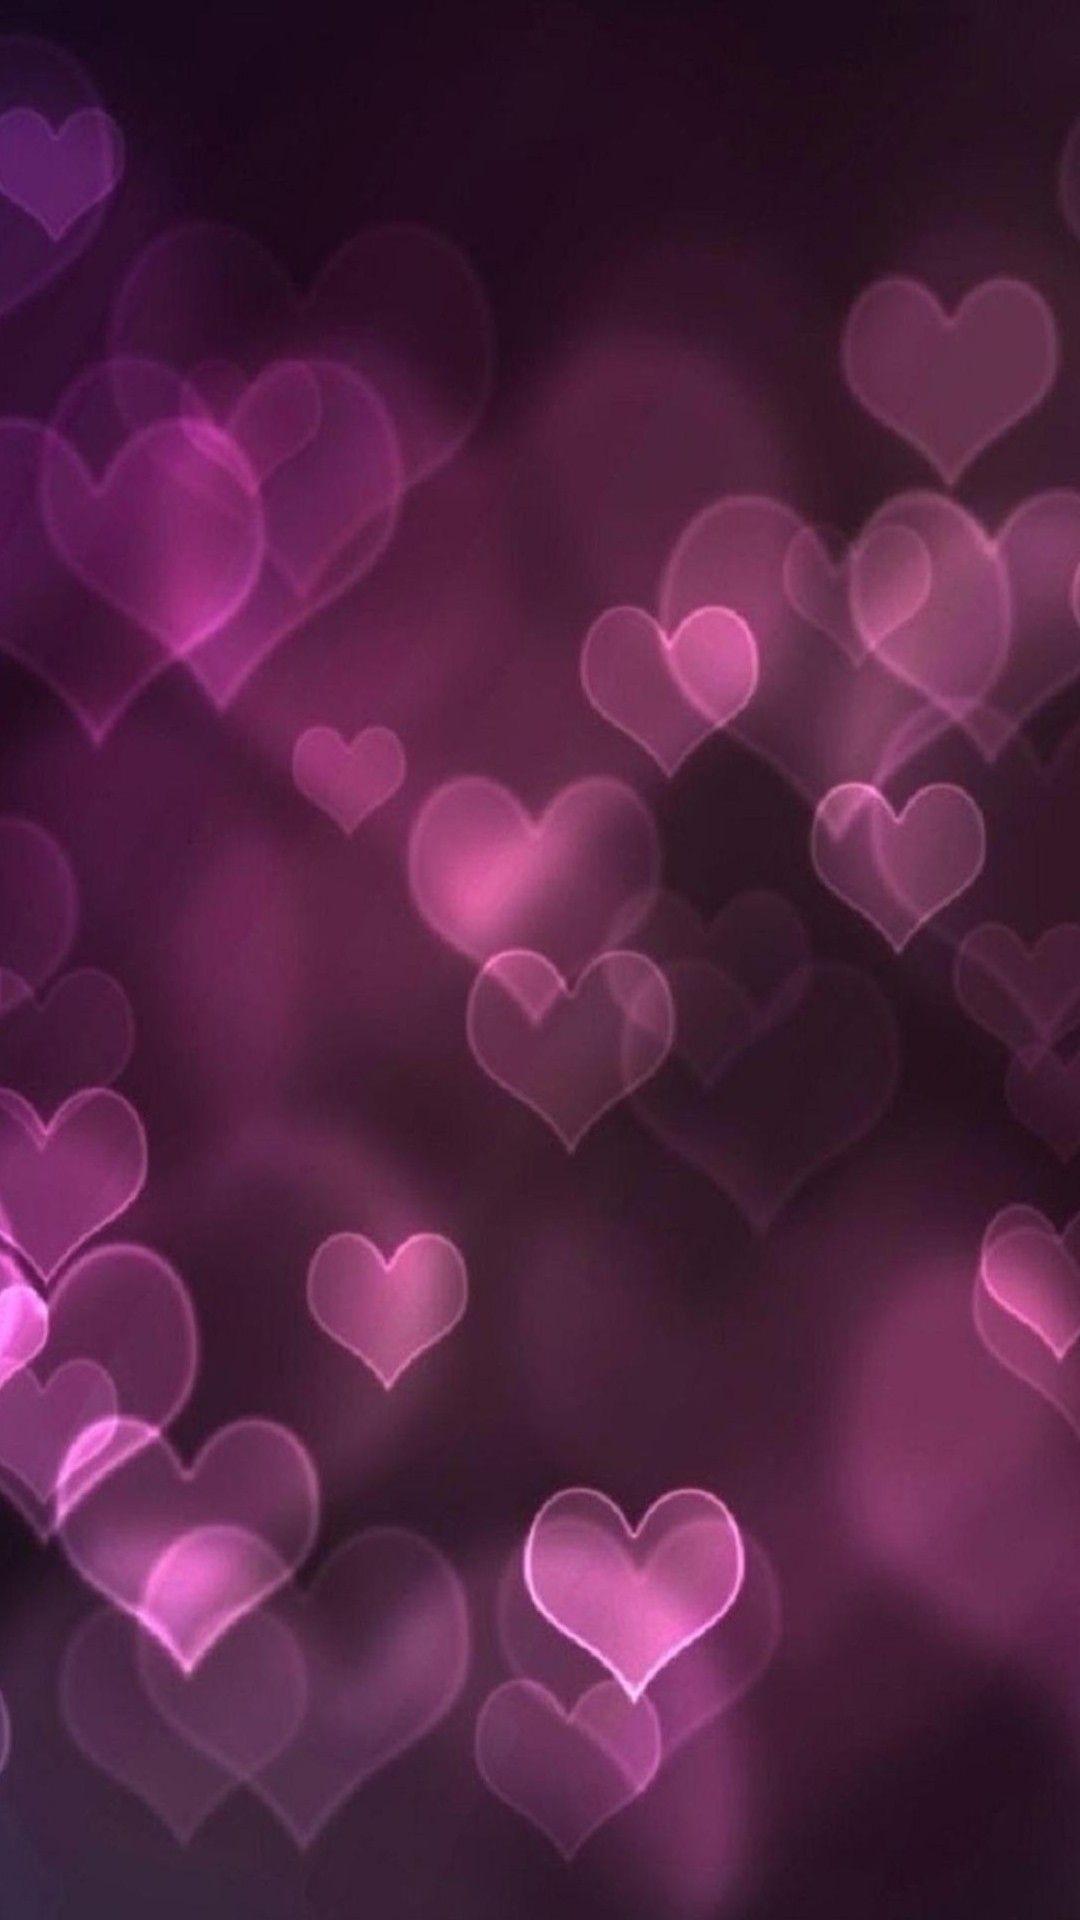 purple-heart-girly-pink-iphone-6-plus-1080×1920-